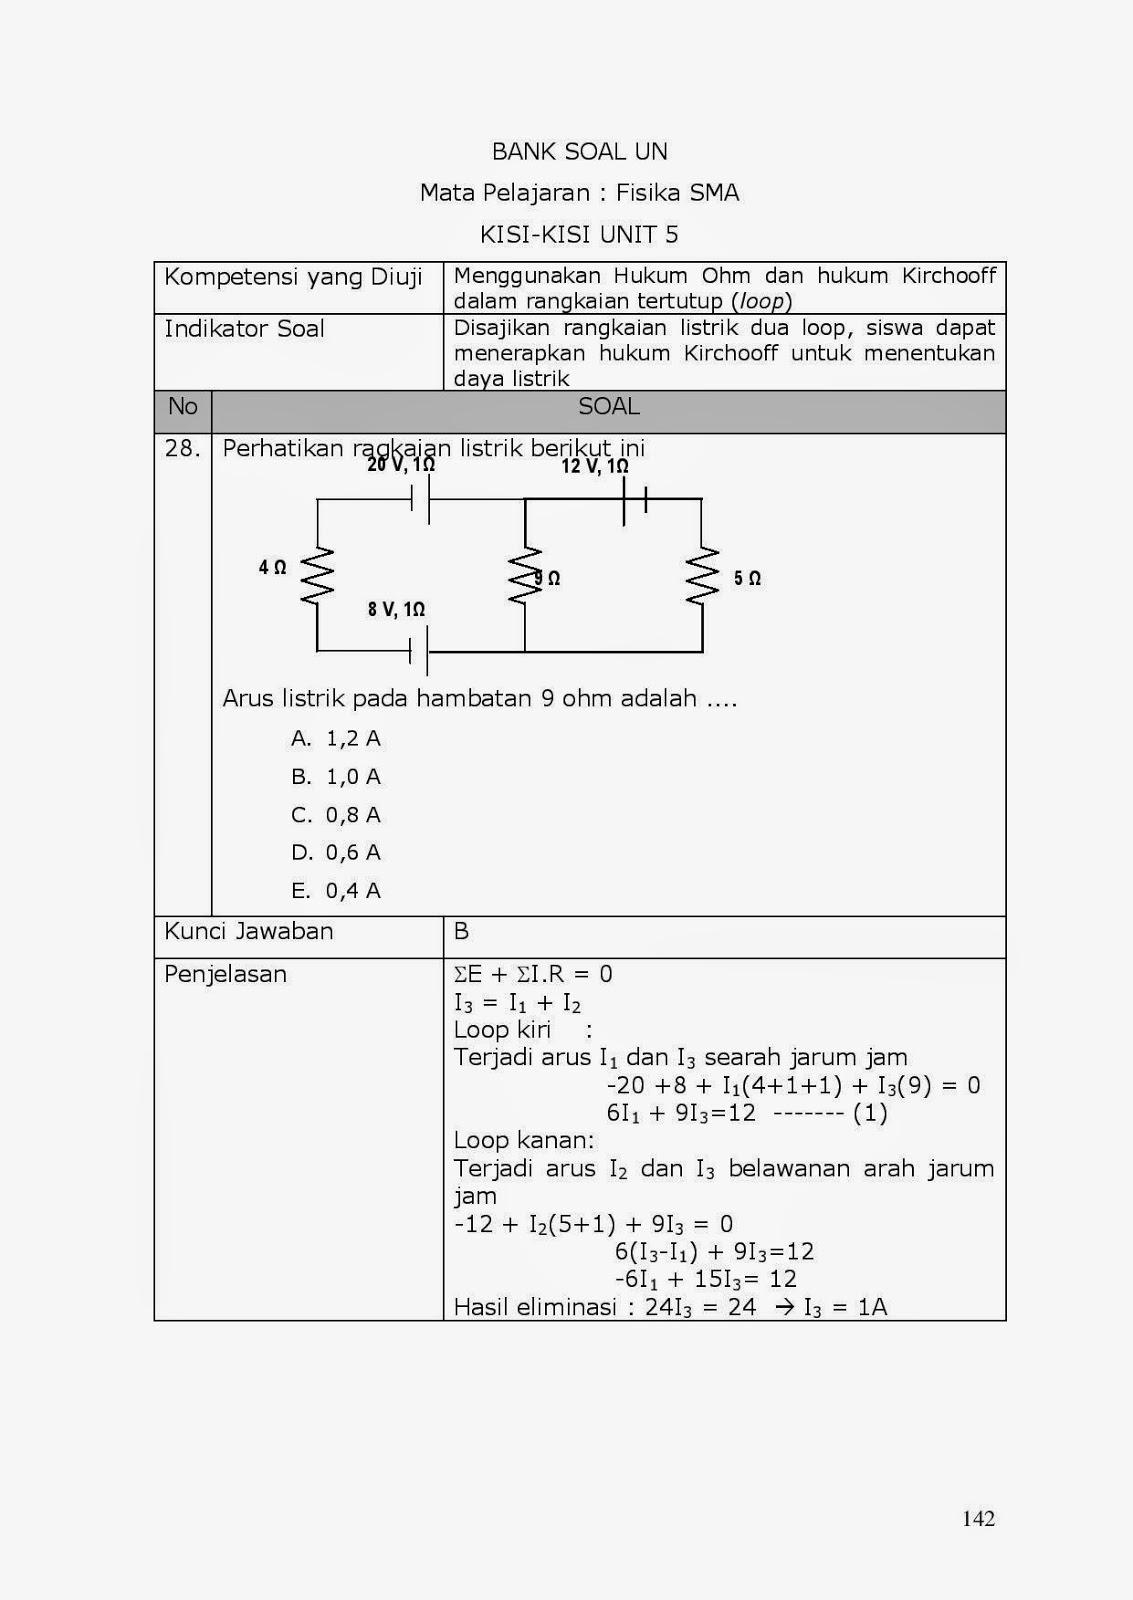 Achmad Saifudin 25 Pembahasan Soal Soal Un Fisika Listrik Dinamis Hukum Kirchoff 2